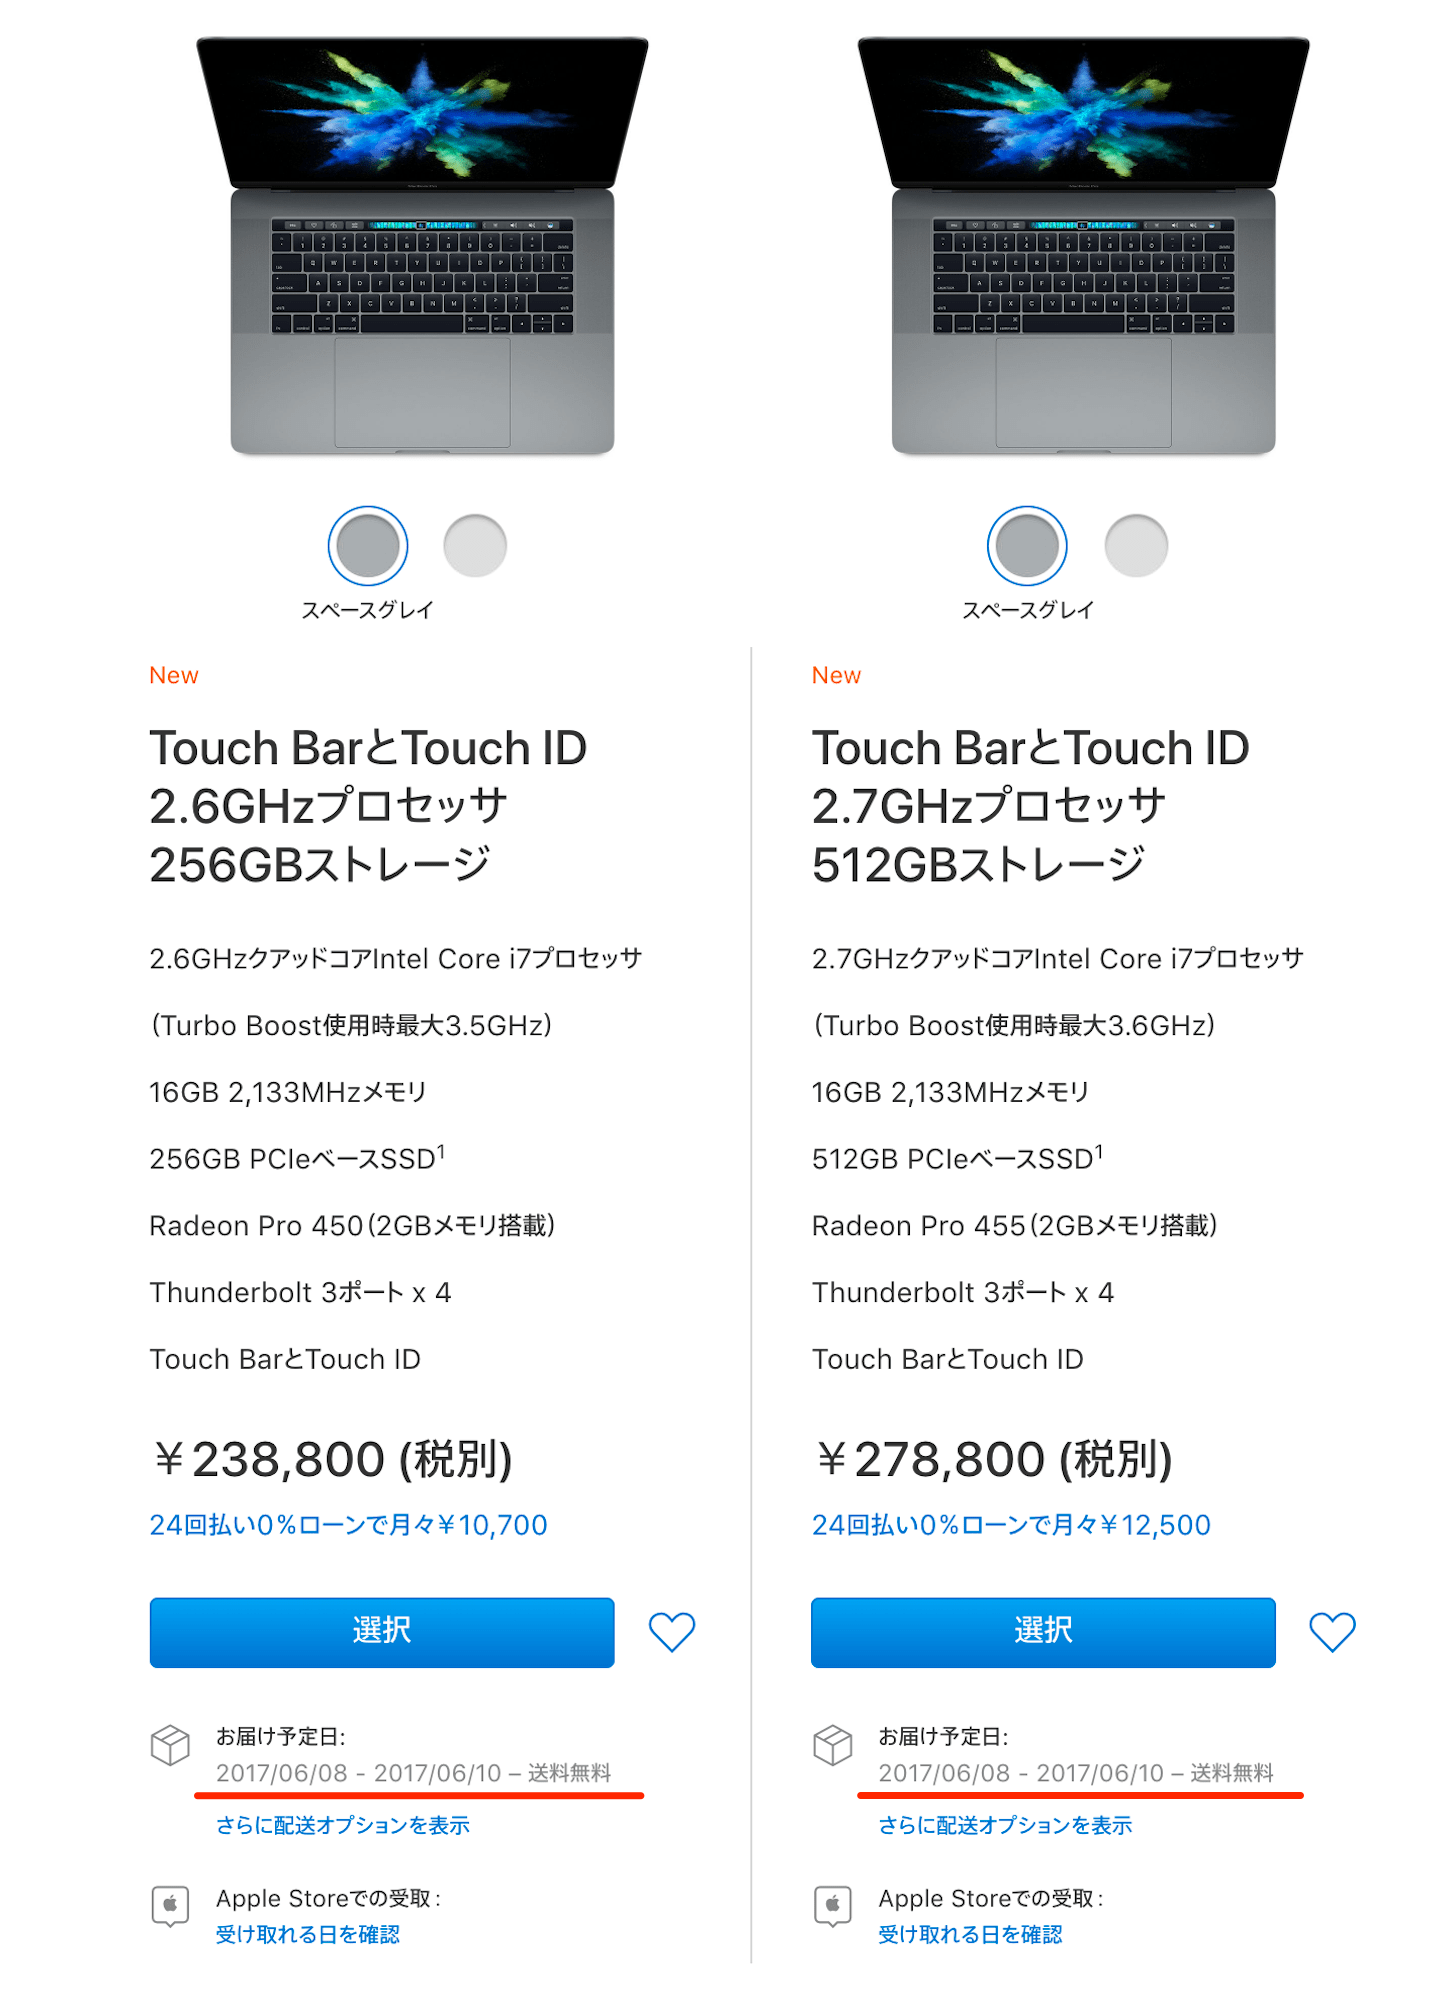 MacBook-Pro-15-inch.png